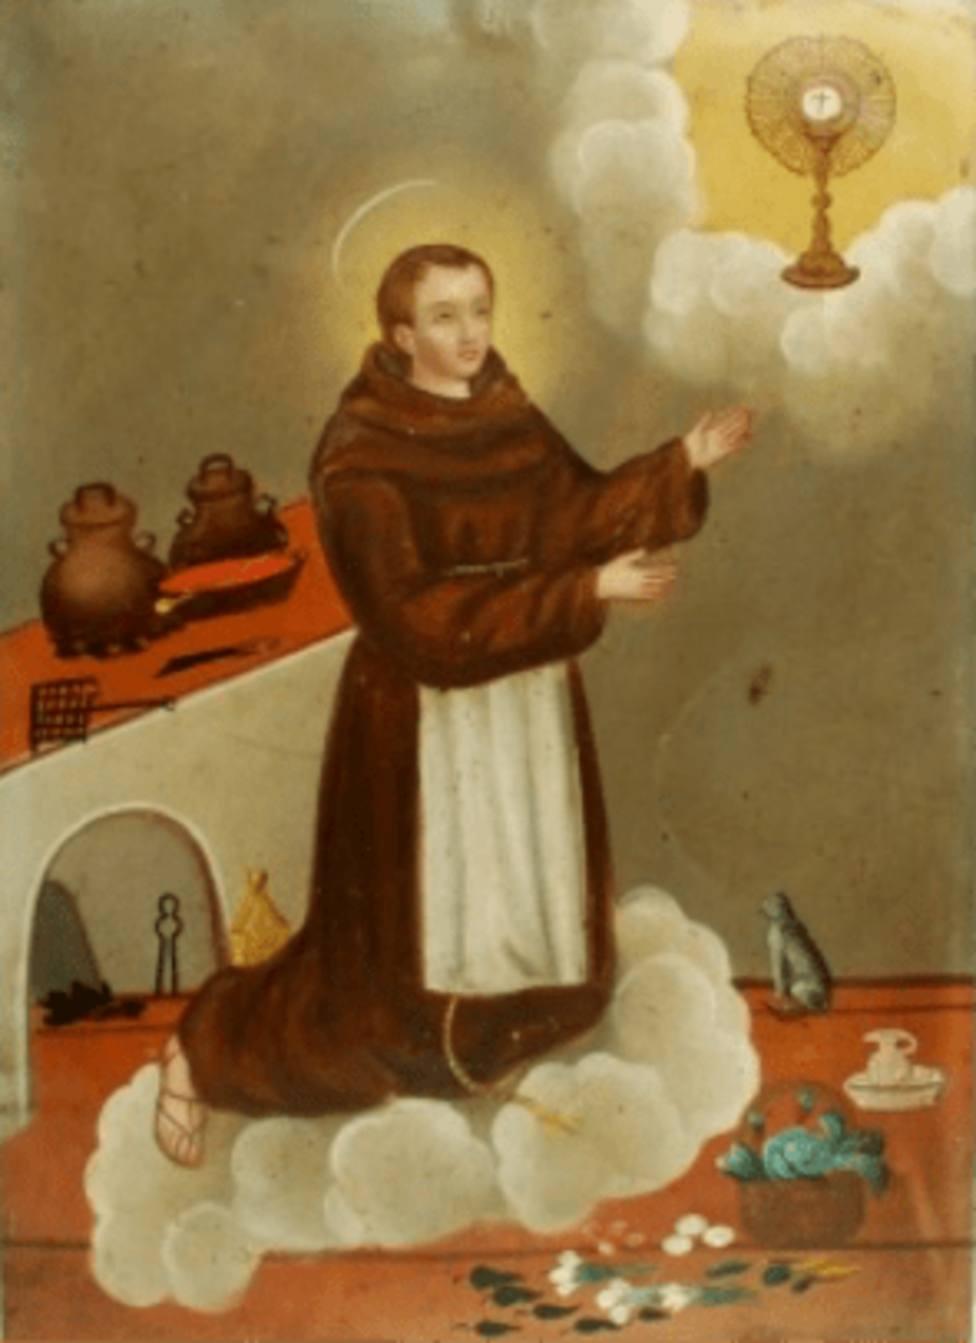 Santoral: San Pascual Bailón, humilde adorador eucarístico hasta el final